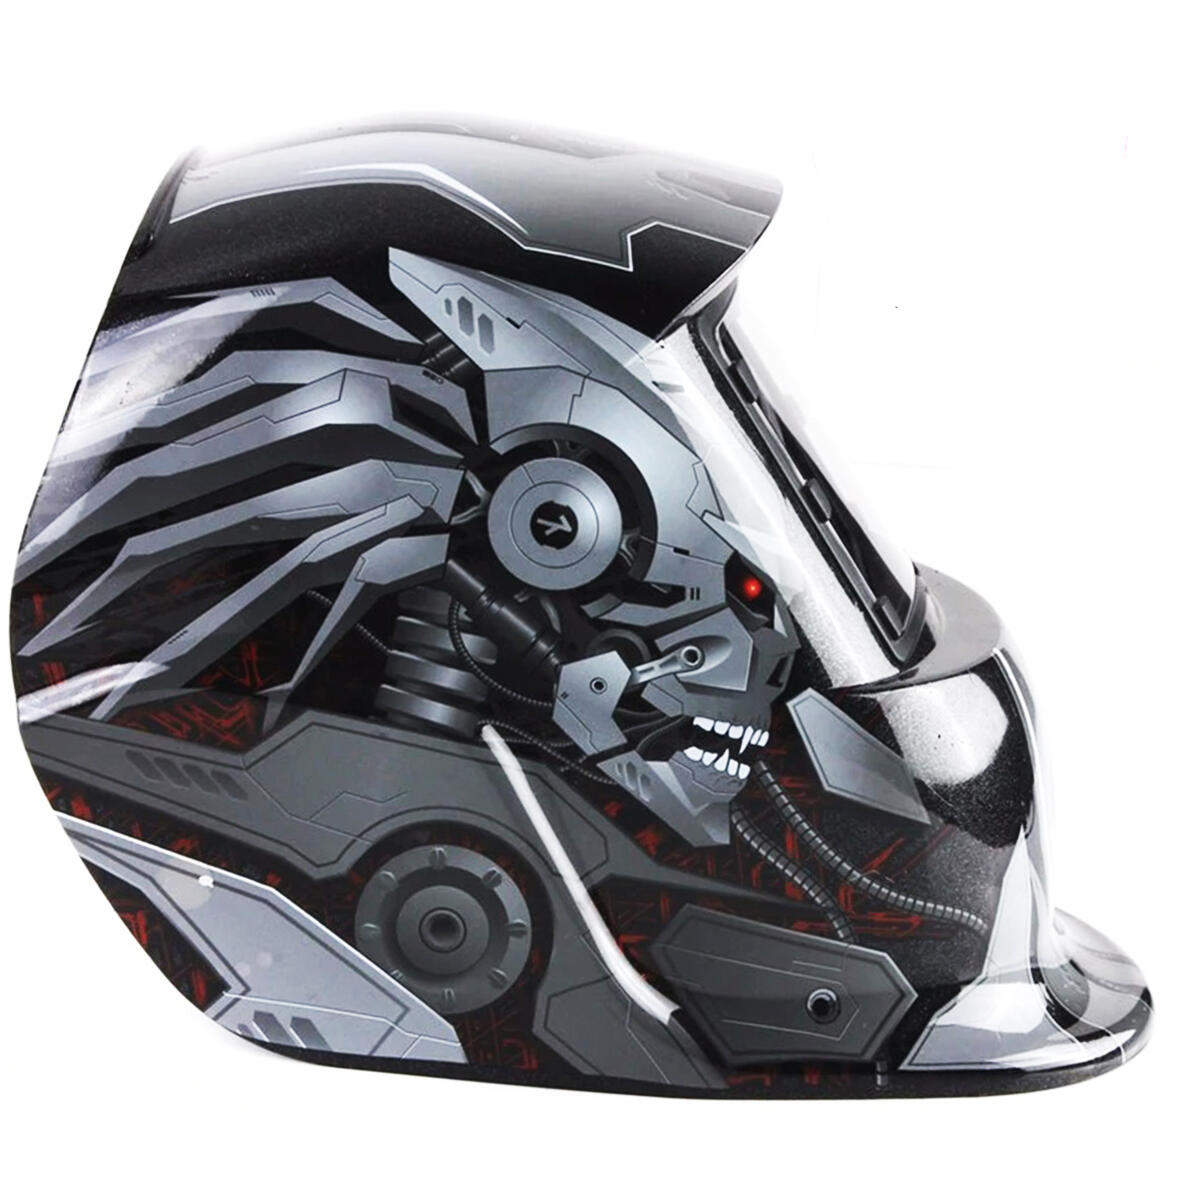 True Color Solar Powered Auto Darkening Welding Helmet with Adjustable Shade Range, Tig Arc Welder Mask (Terminator)